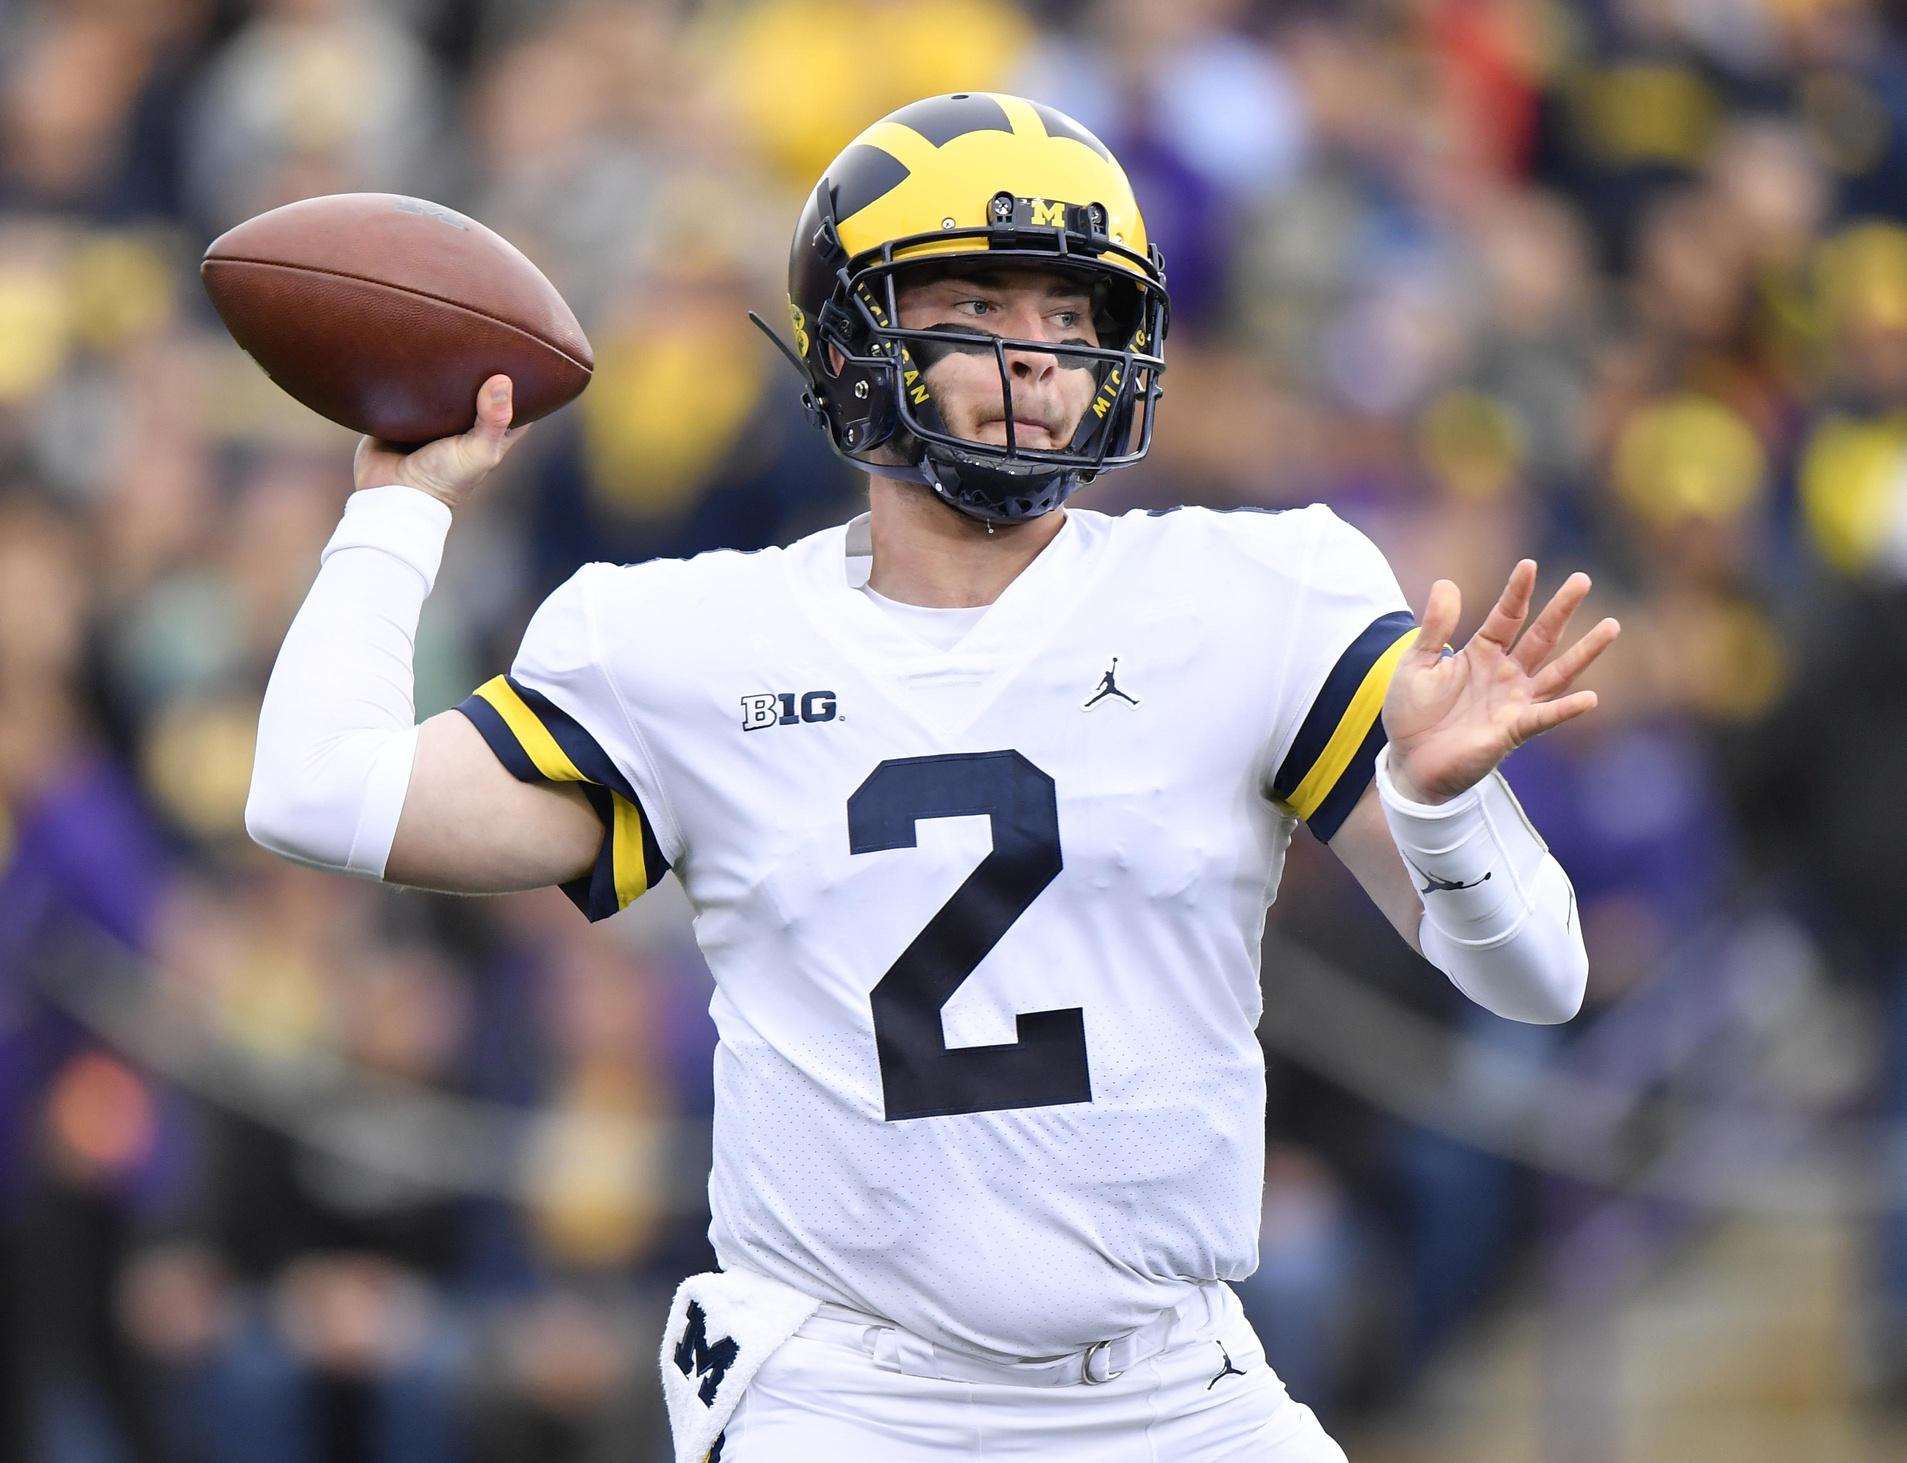 quality design 76825 4671b Michigan quarterback Shea Patterson has the clutch gene, and ...